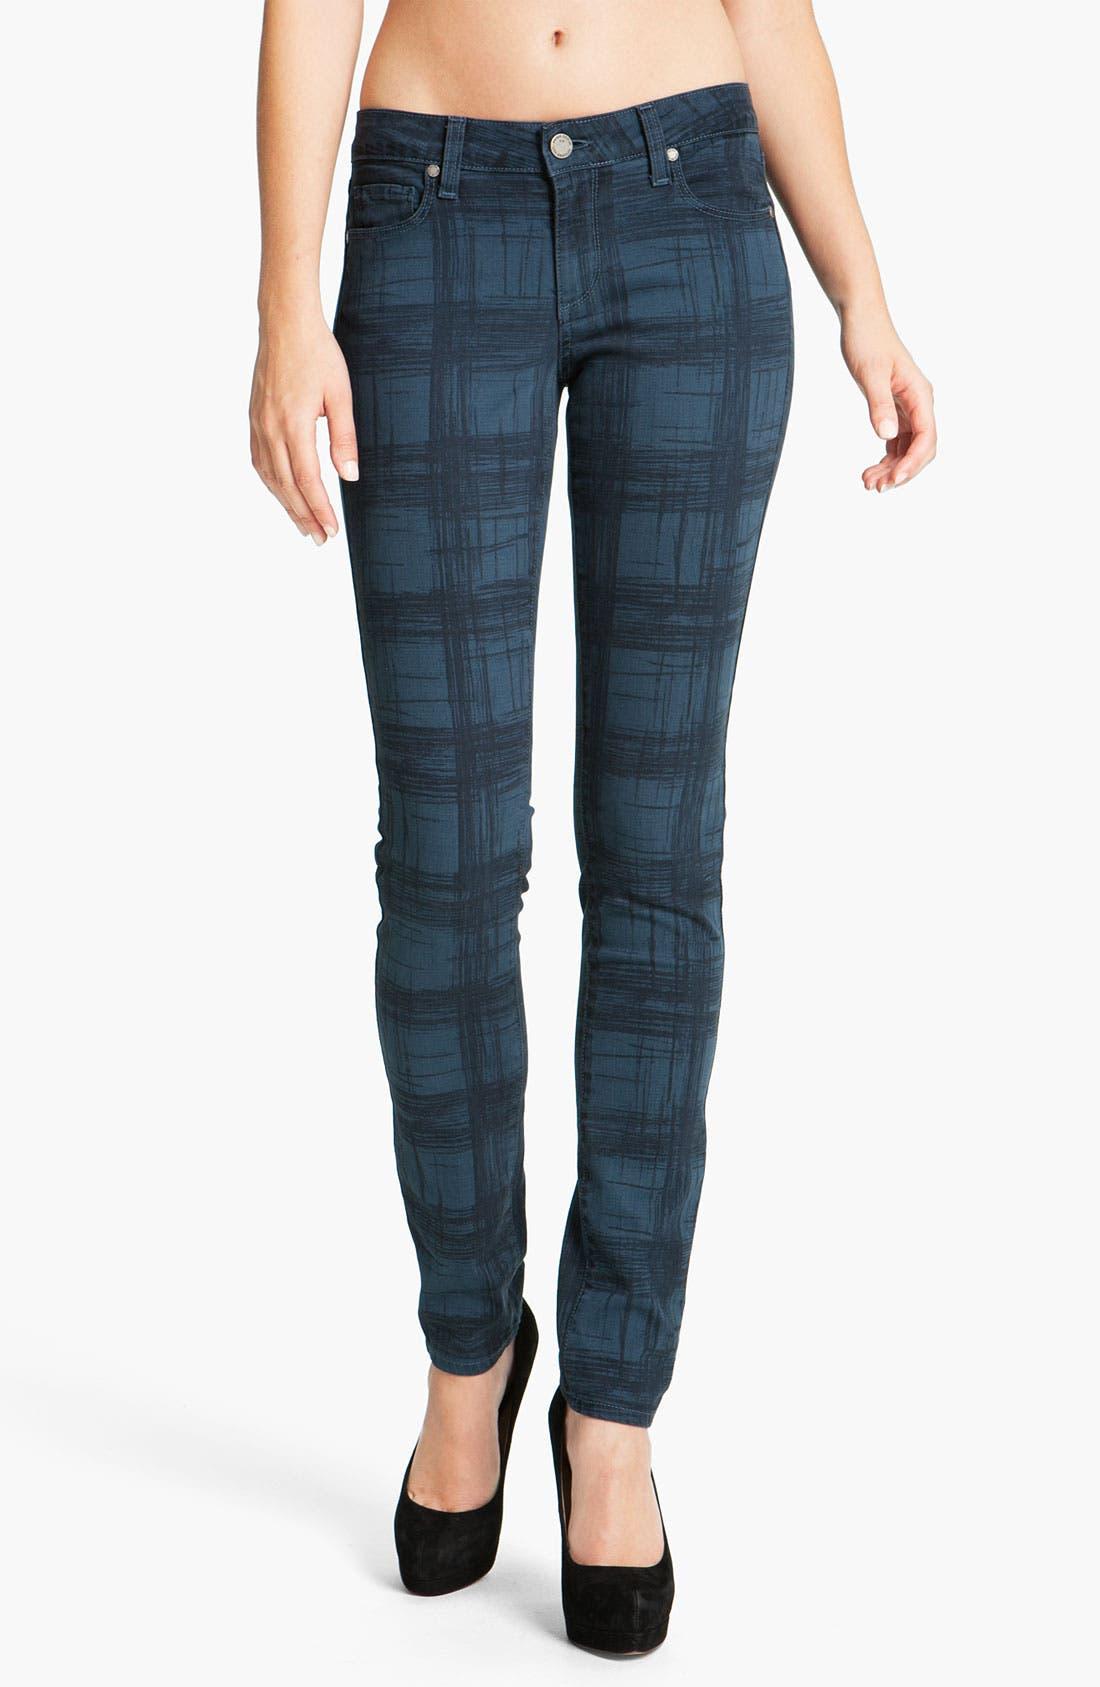 Alternate Image 1 Selected - Paige Denim 'Verdugo' Skinny Jeans (Preppy)